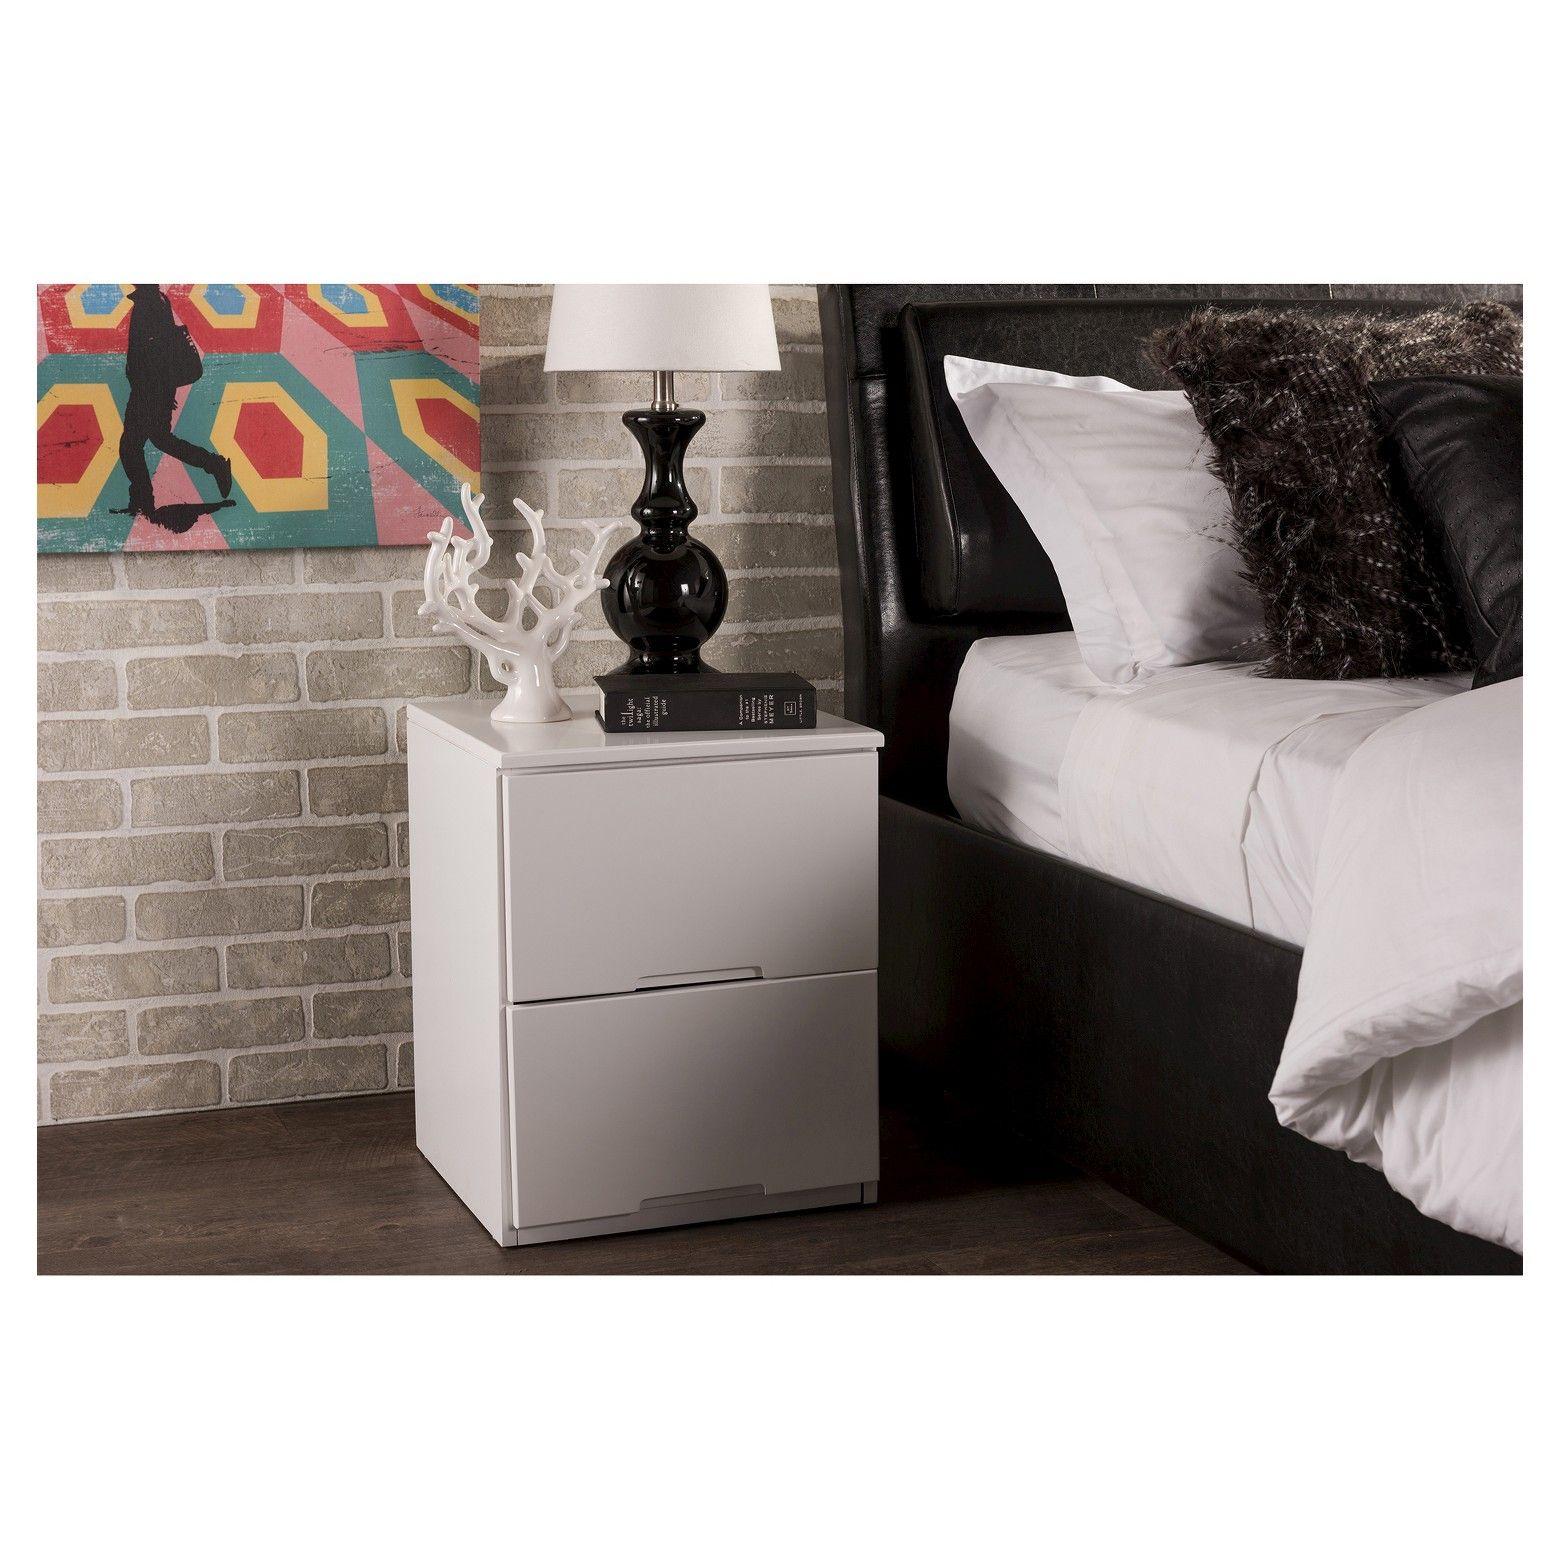 The Washington 2drawer white nightstand will create a